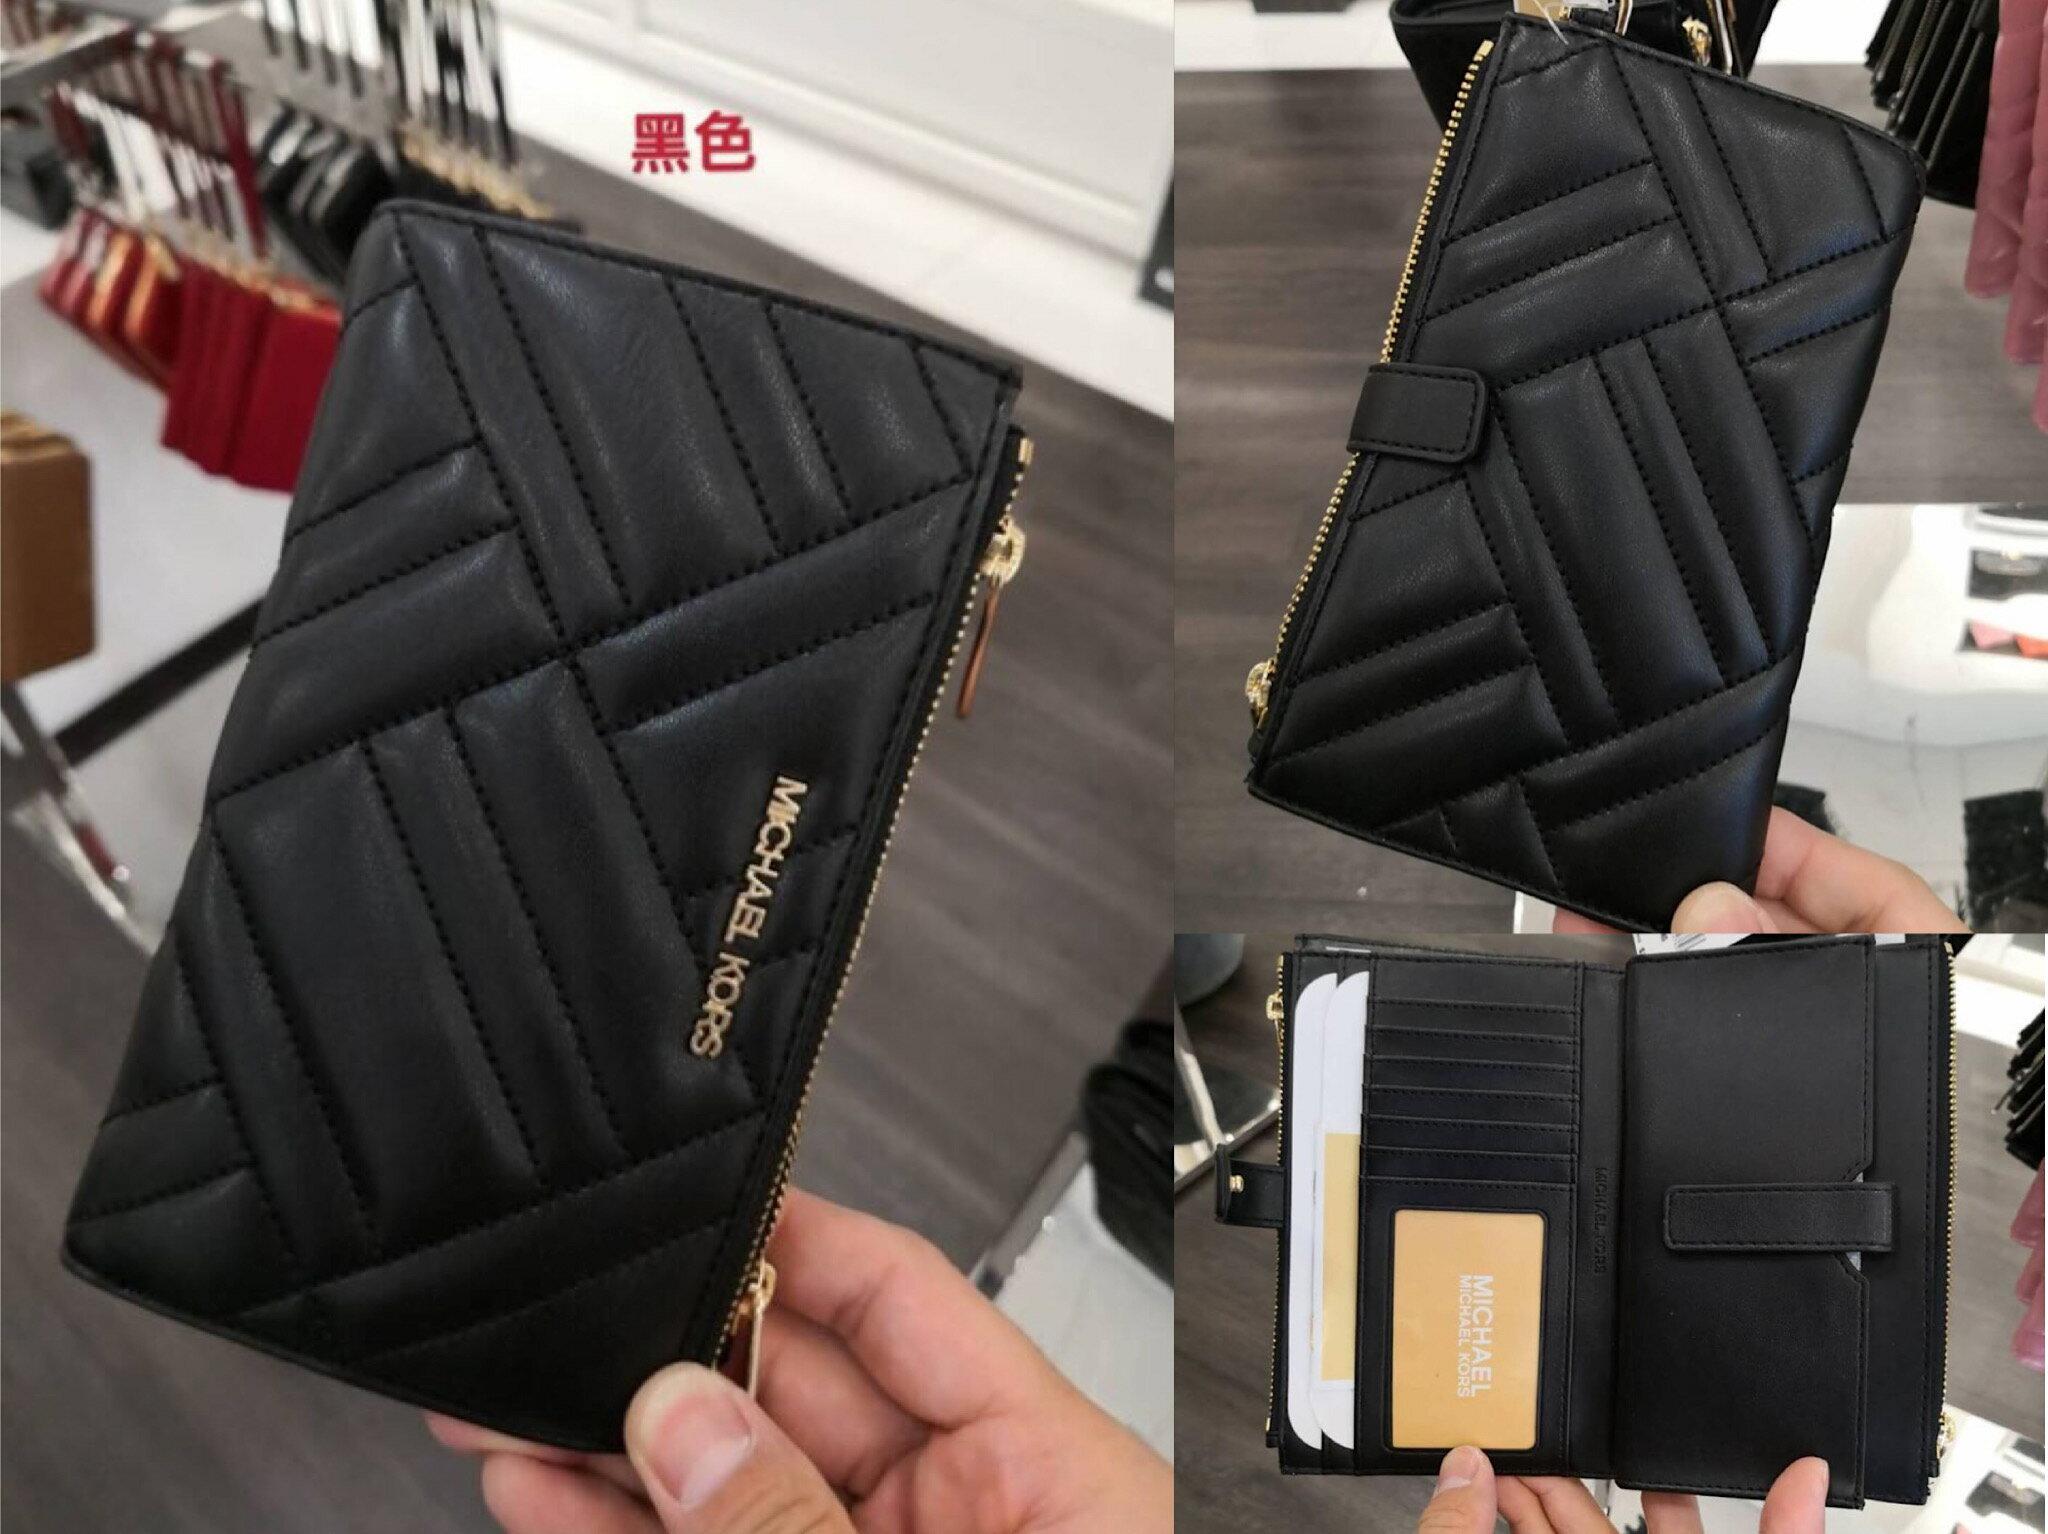 *vivi shop*美國正品MICHAEL KORS MK黑色斜紋、紅色愛心 多功能手拿包( 小羊皮真皮款) 長夾 手機包 皮夾 手拿包-(保證美國OUTLET全新直購100%正品)-附購證